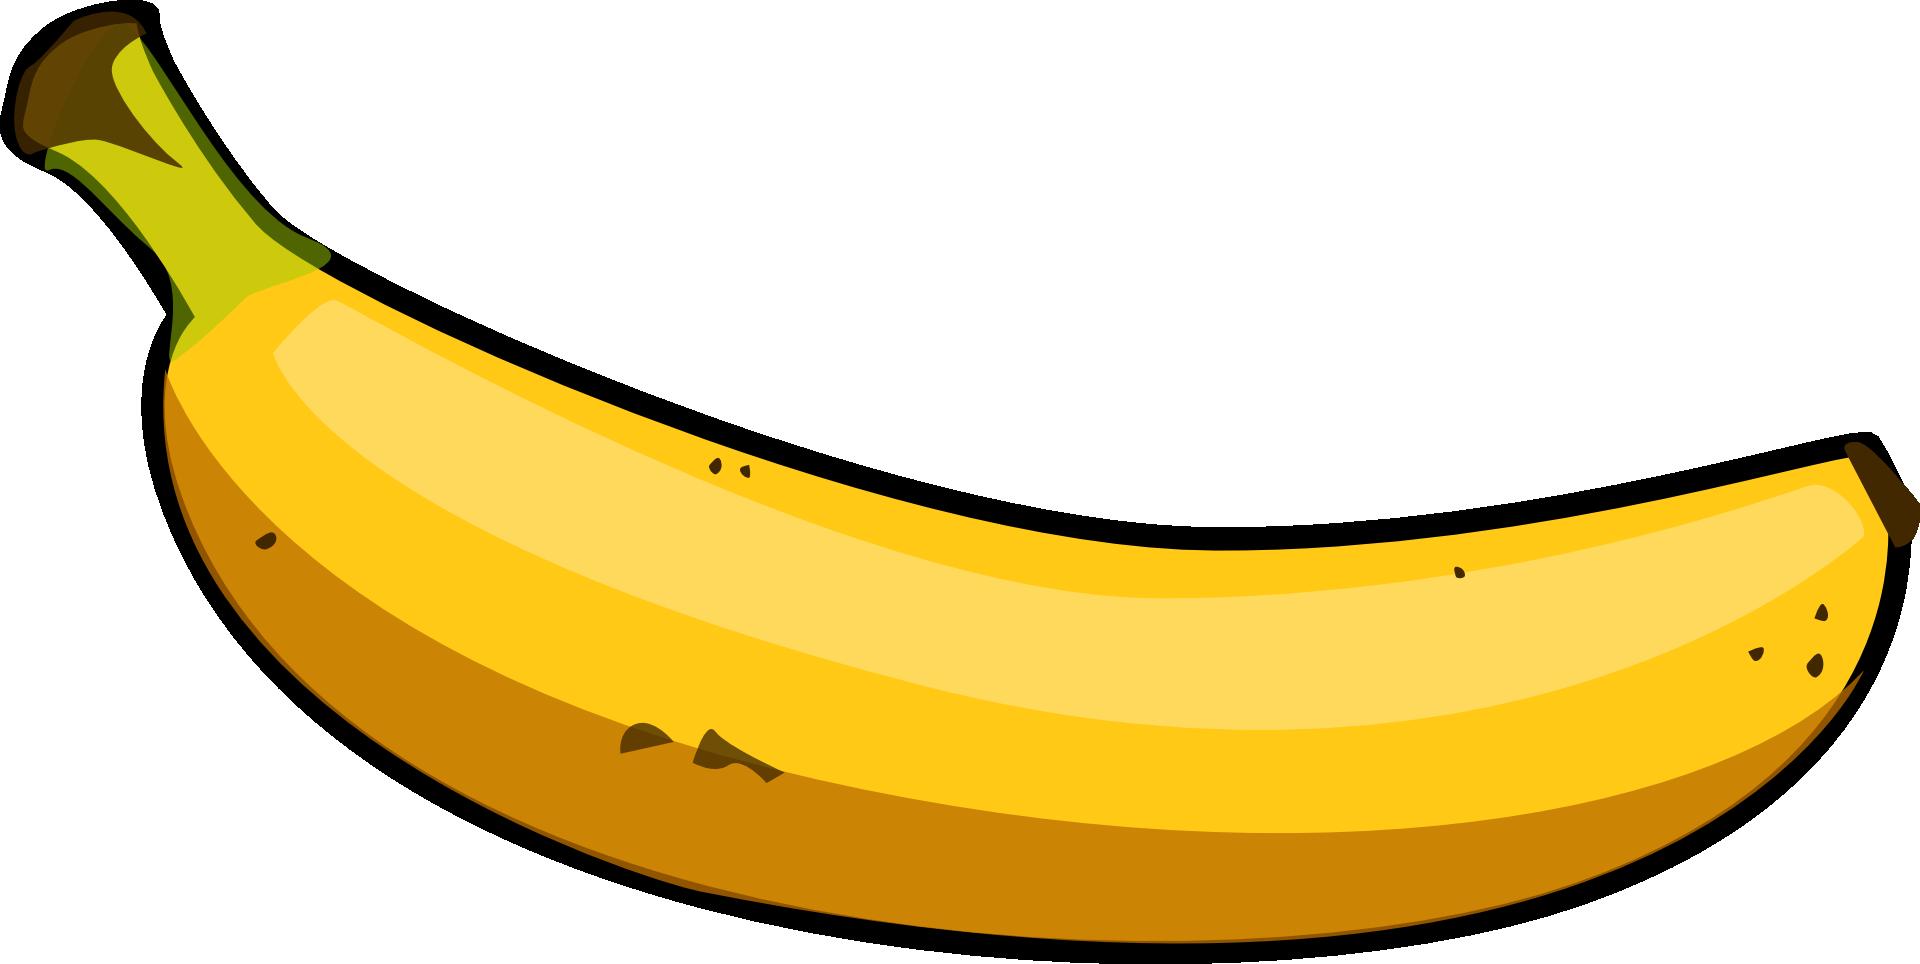 Banana clipart bannana Clip downloadclipart downloadclipart fruit art